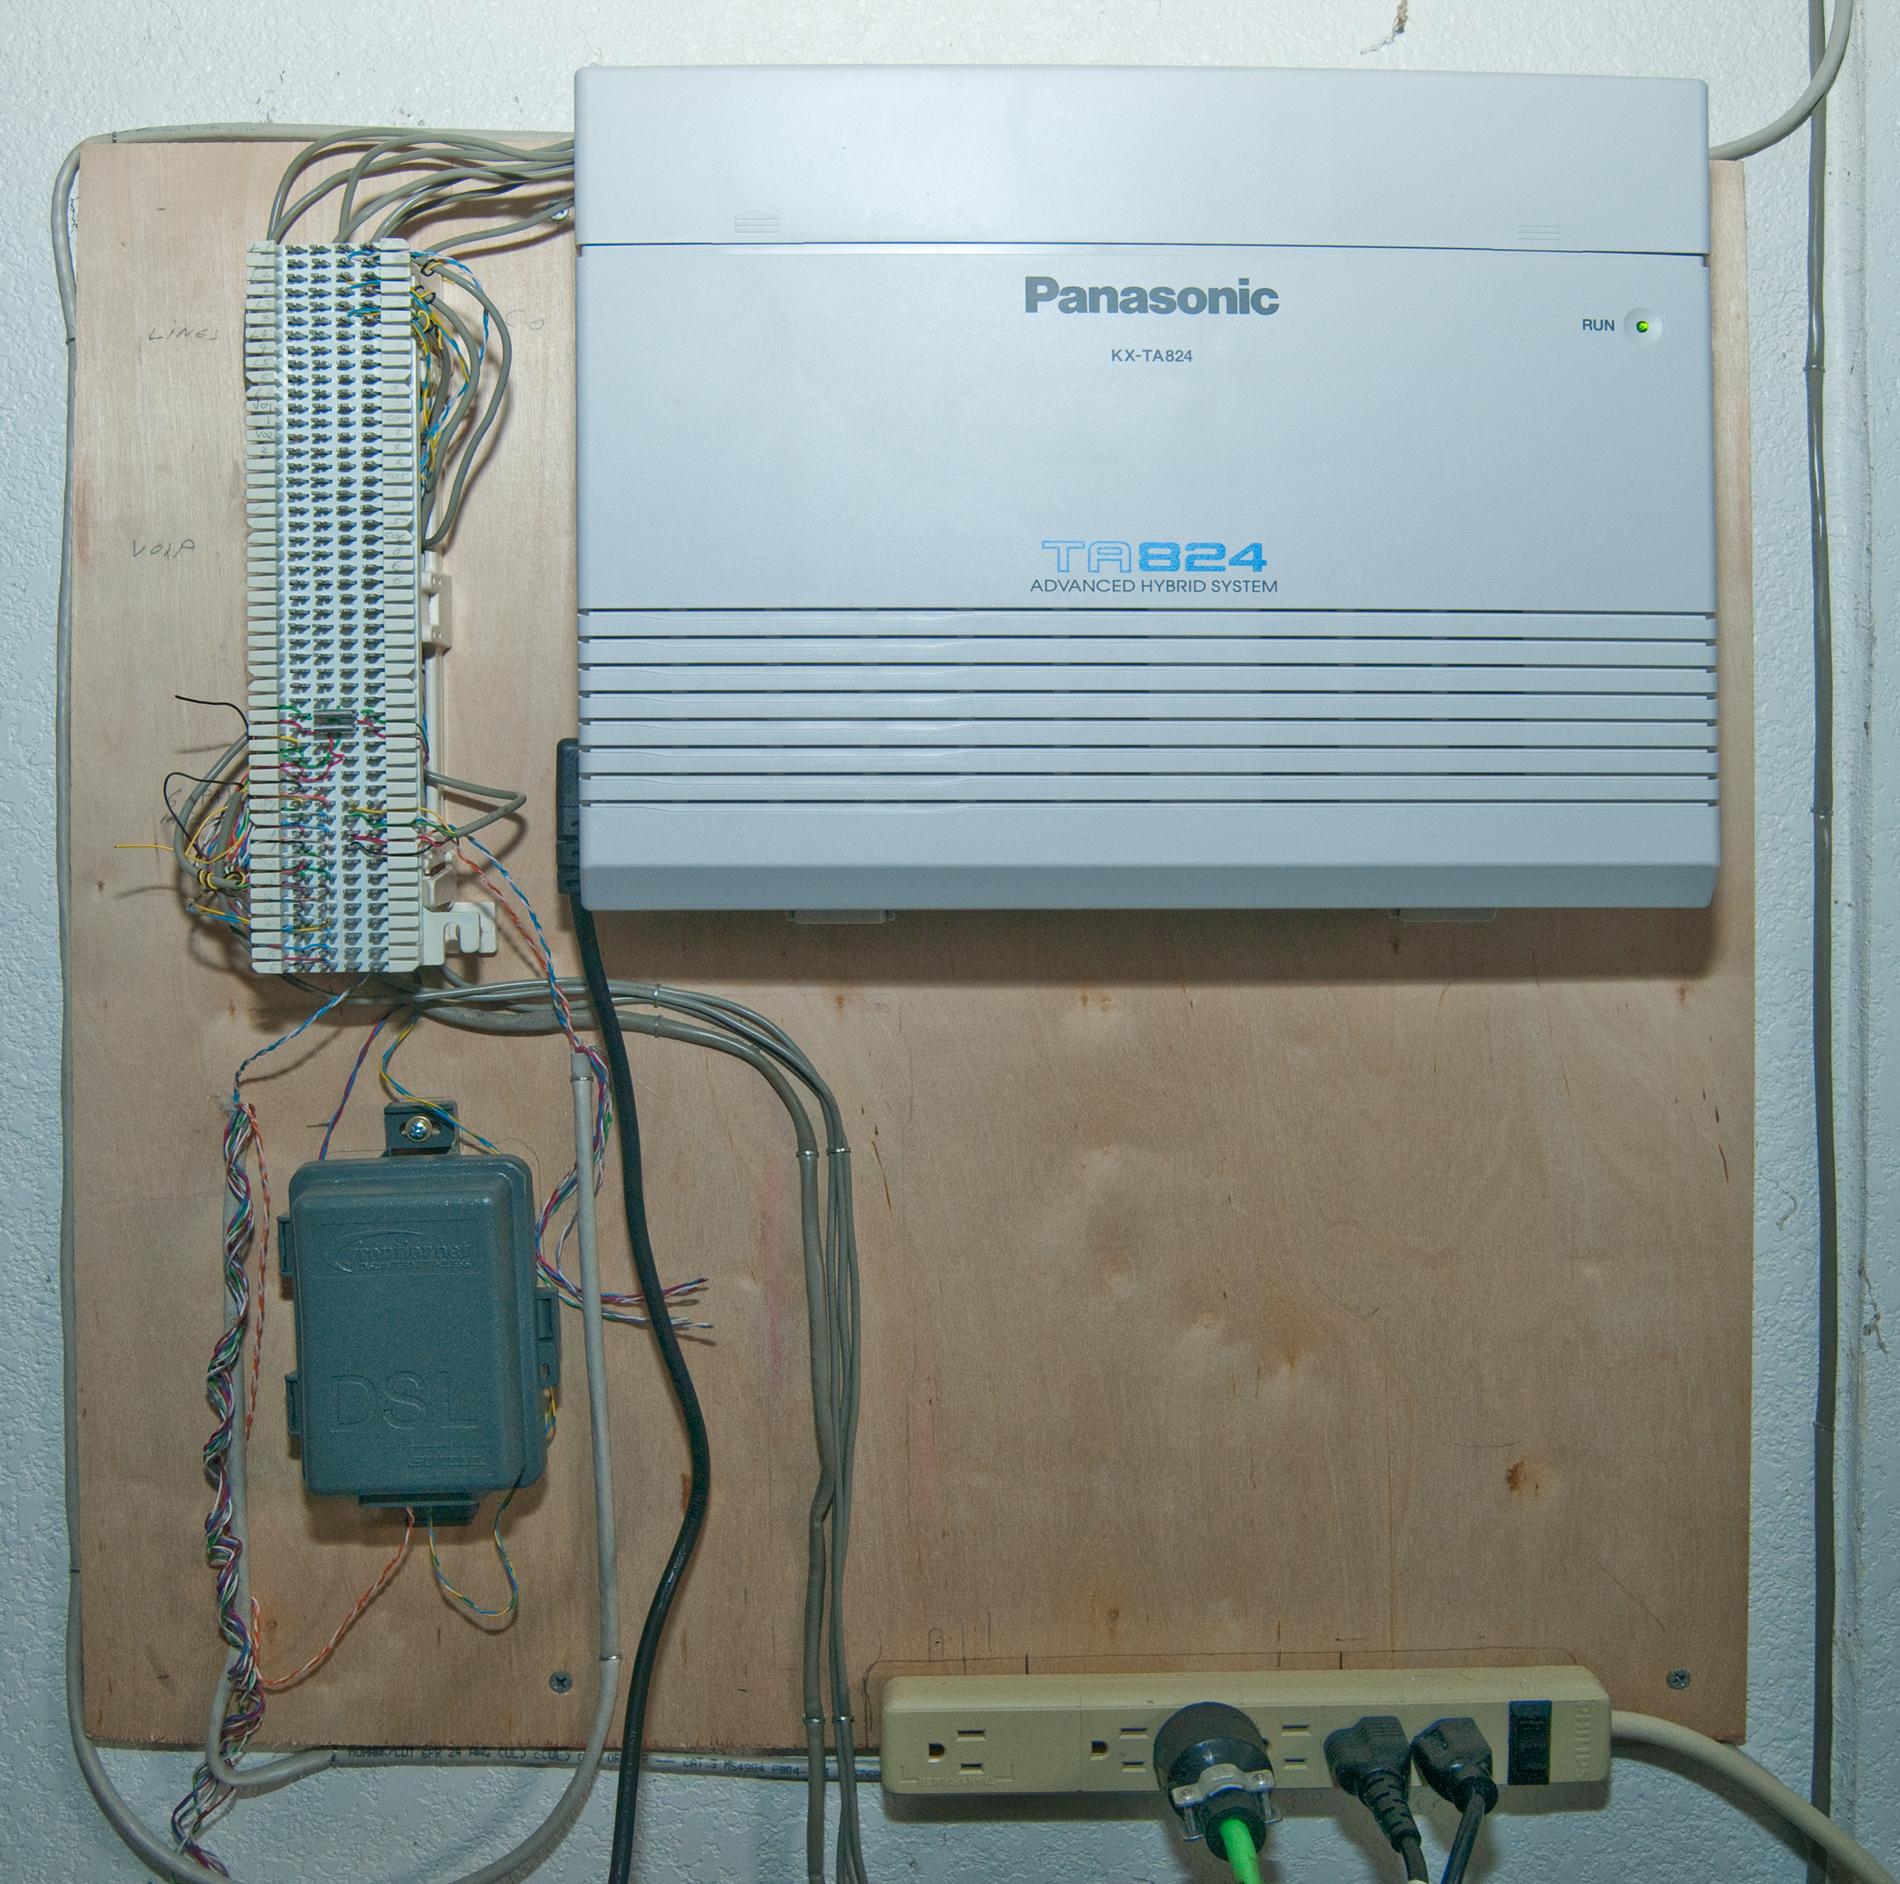 Cat5 Wall Schematic Wiring Diagram Panasonic Kx Ta824 Telephone System